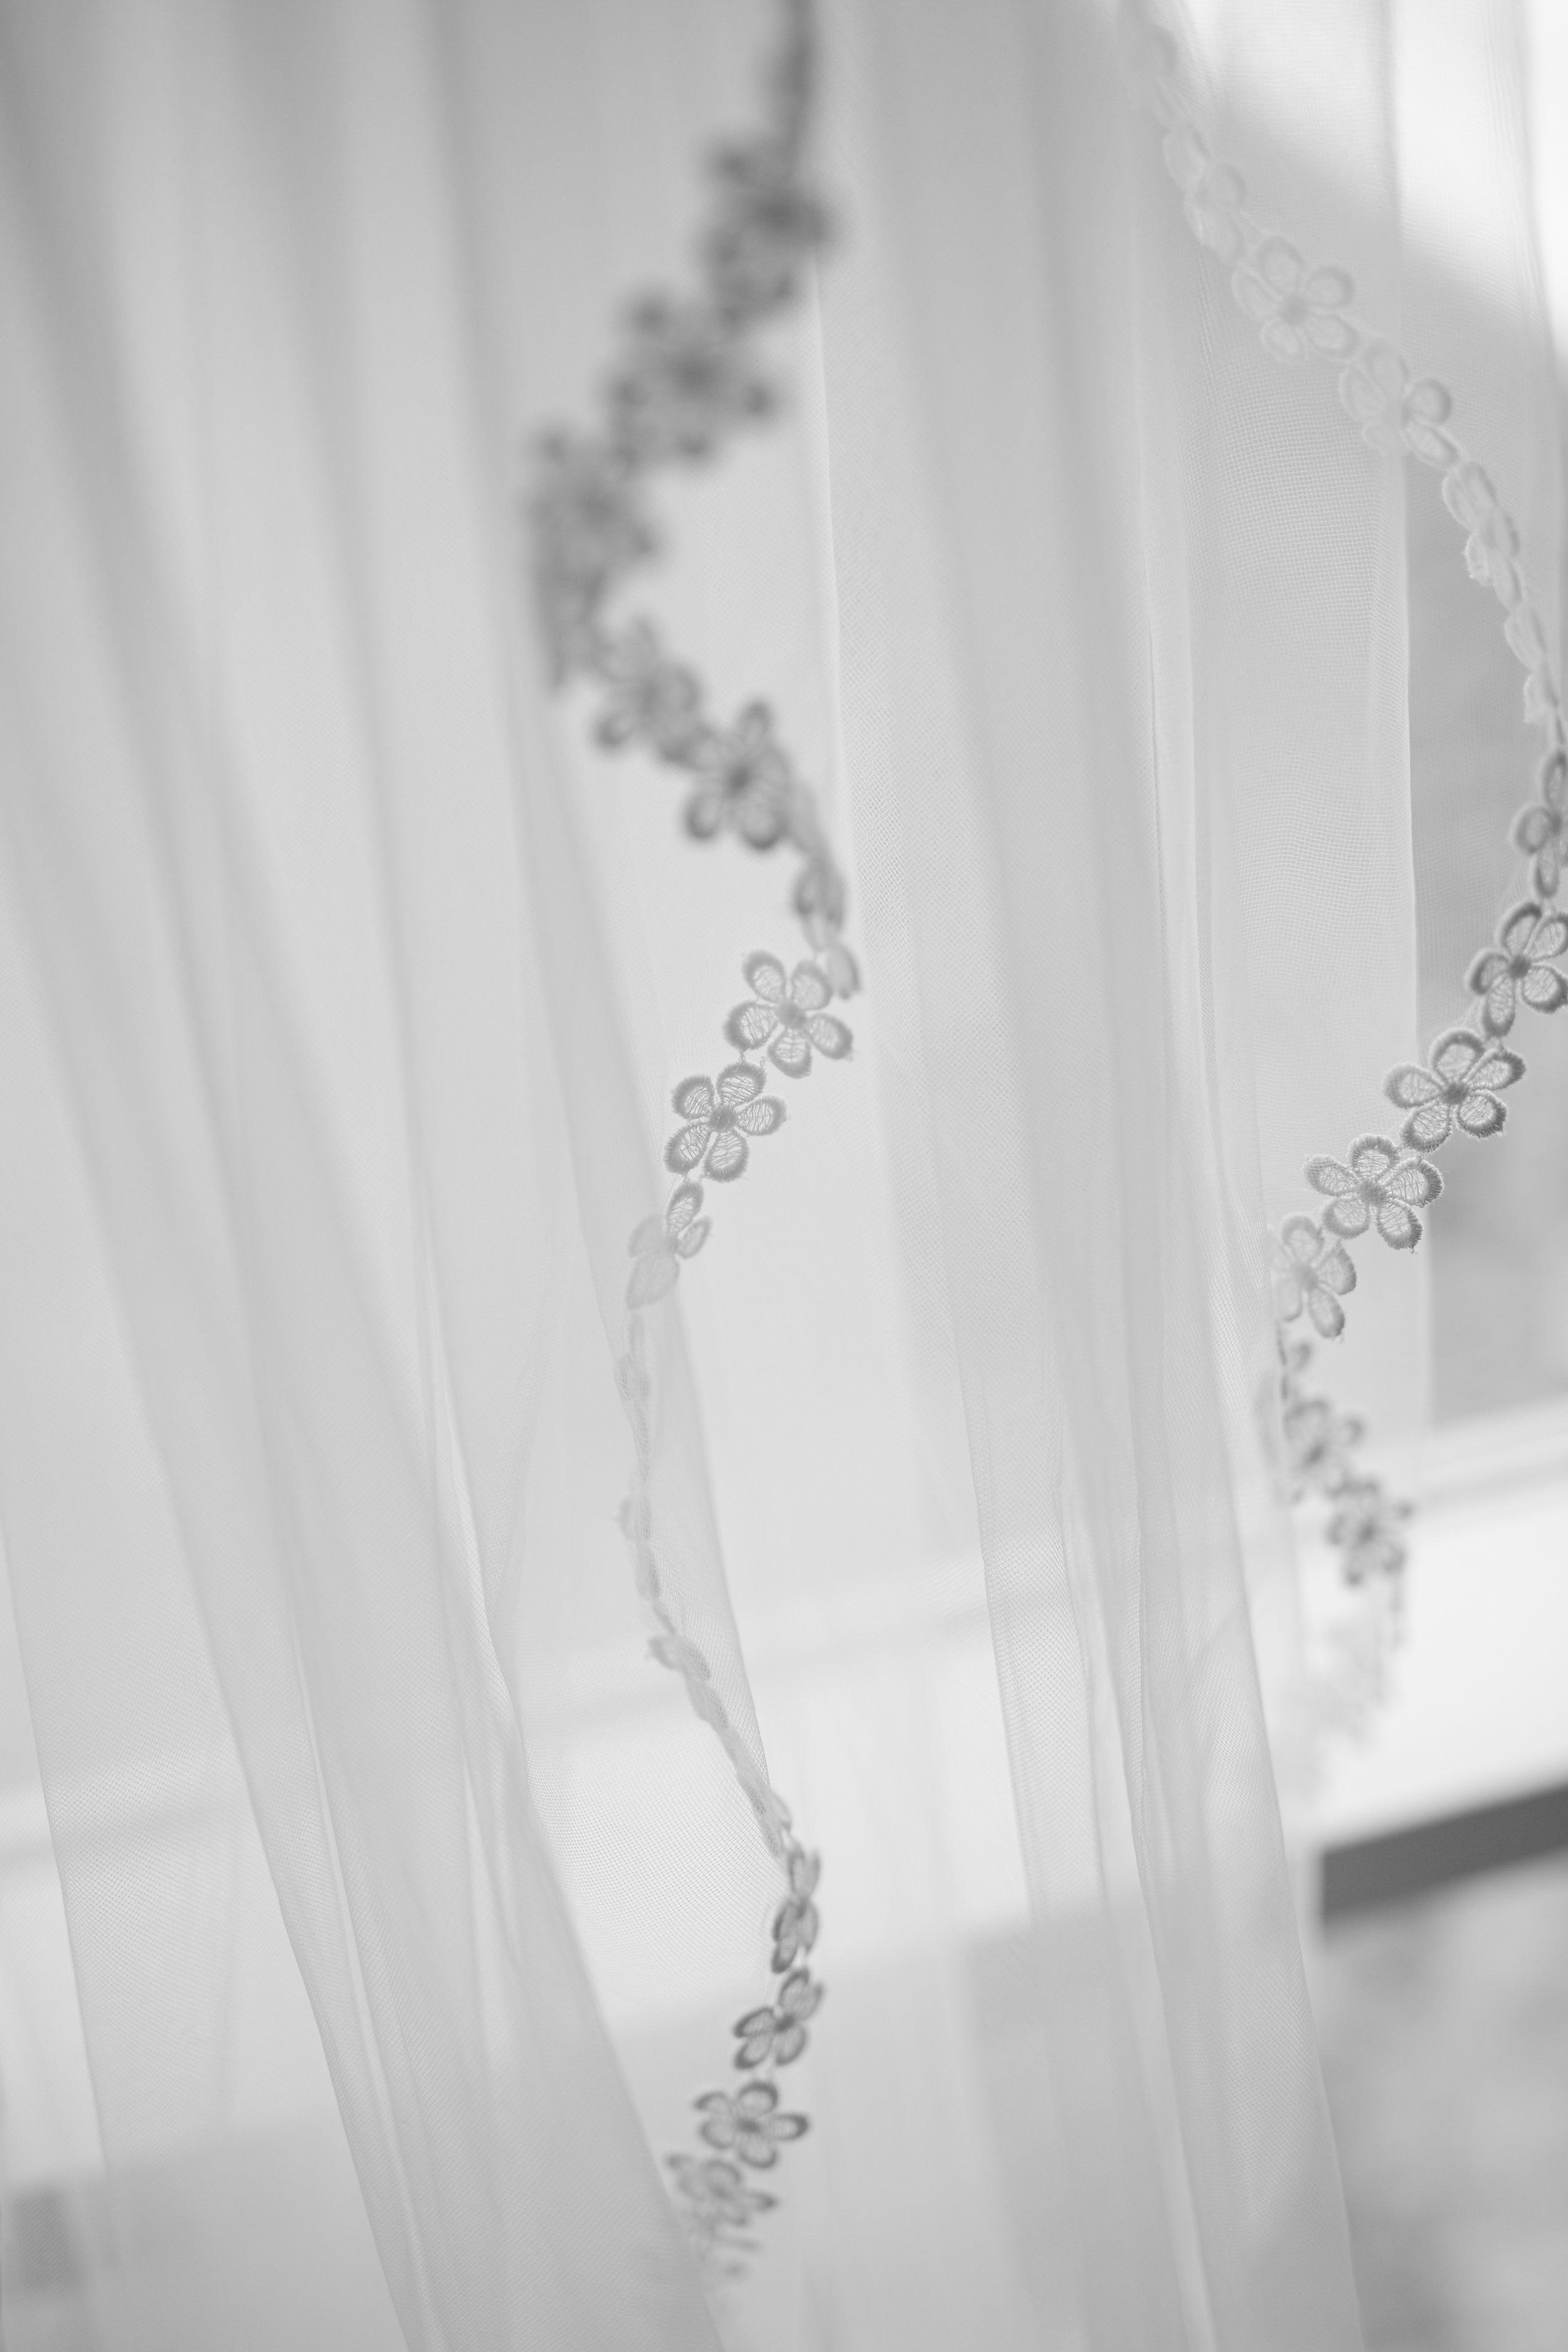 Liz & Josh Wedding -  benromangphoto - 6I5A9755.jpg